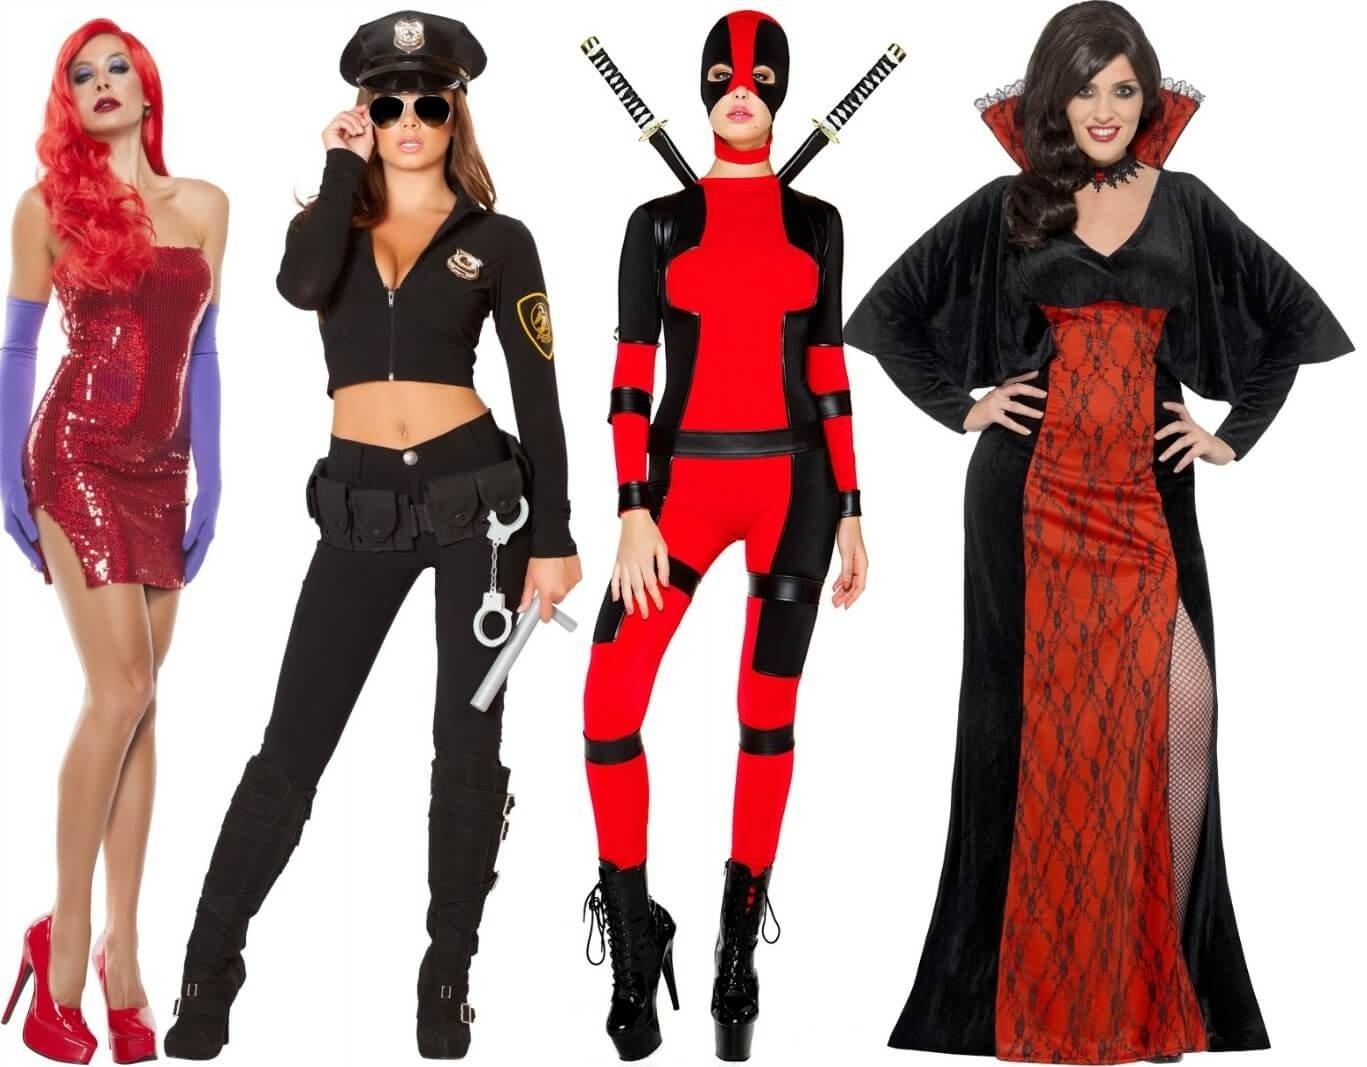 10 Stunning Halloween Costumes For Women Ideas cheap halloween costume ideas halloween costumes blog 9 2020